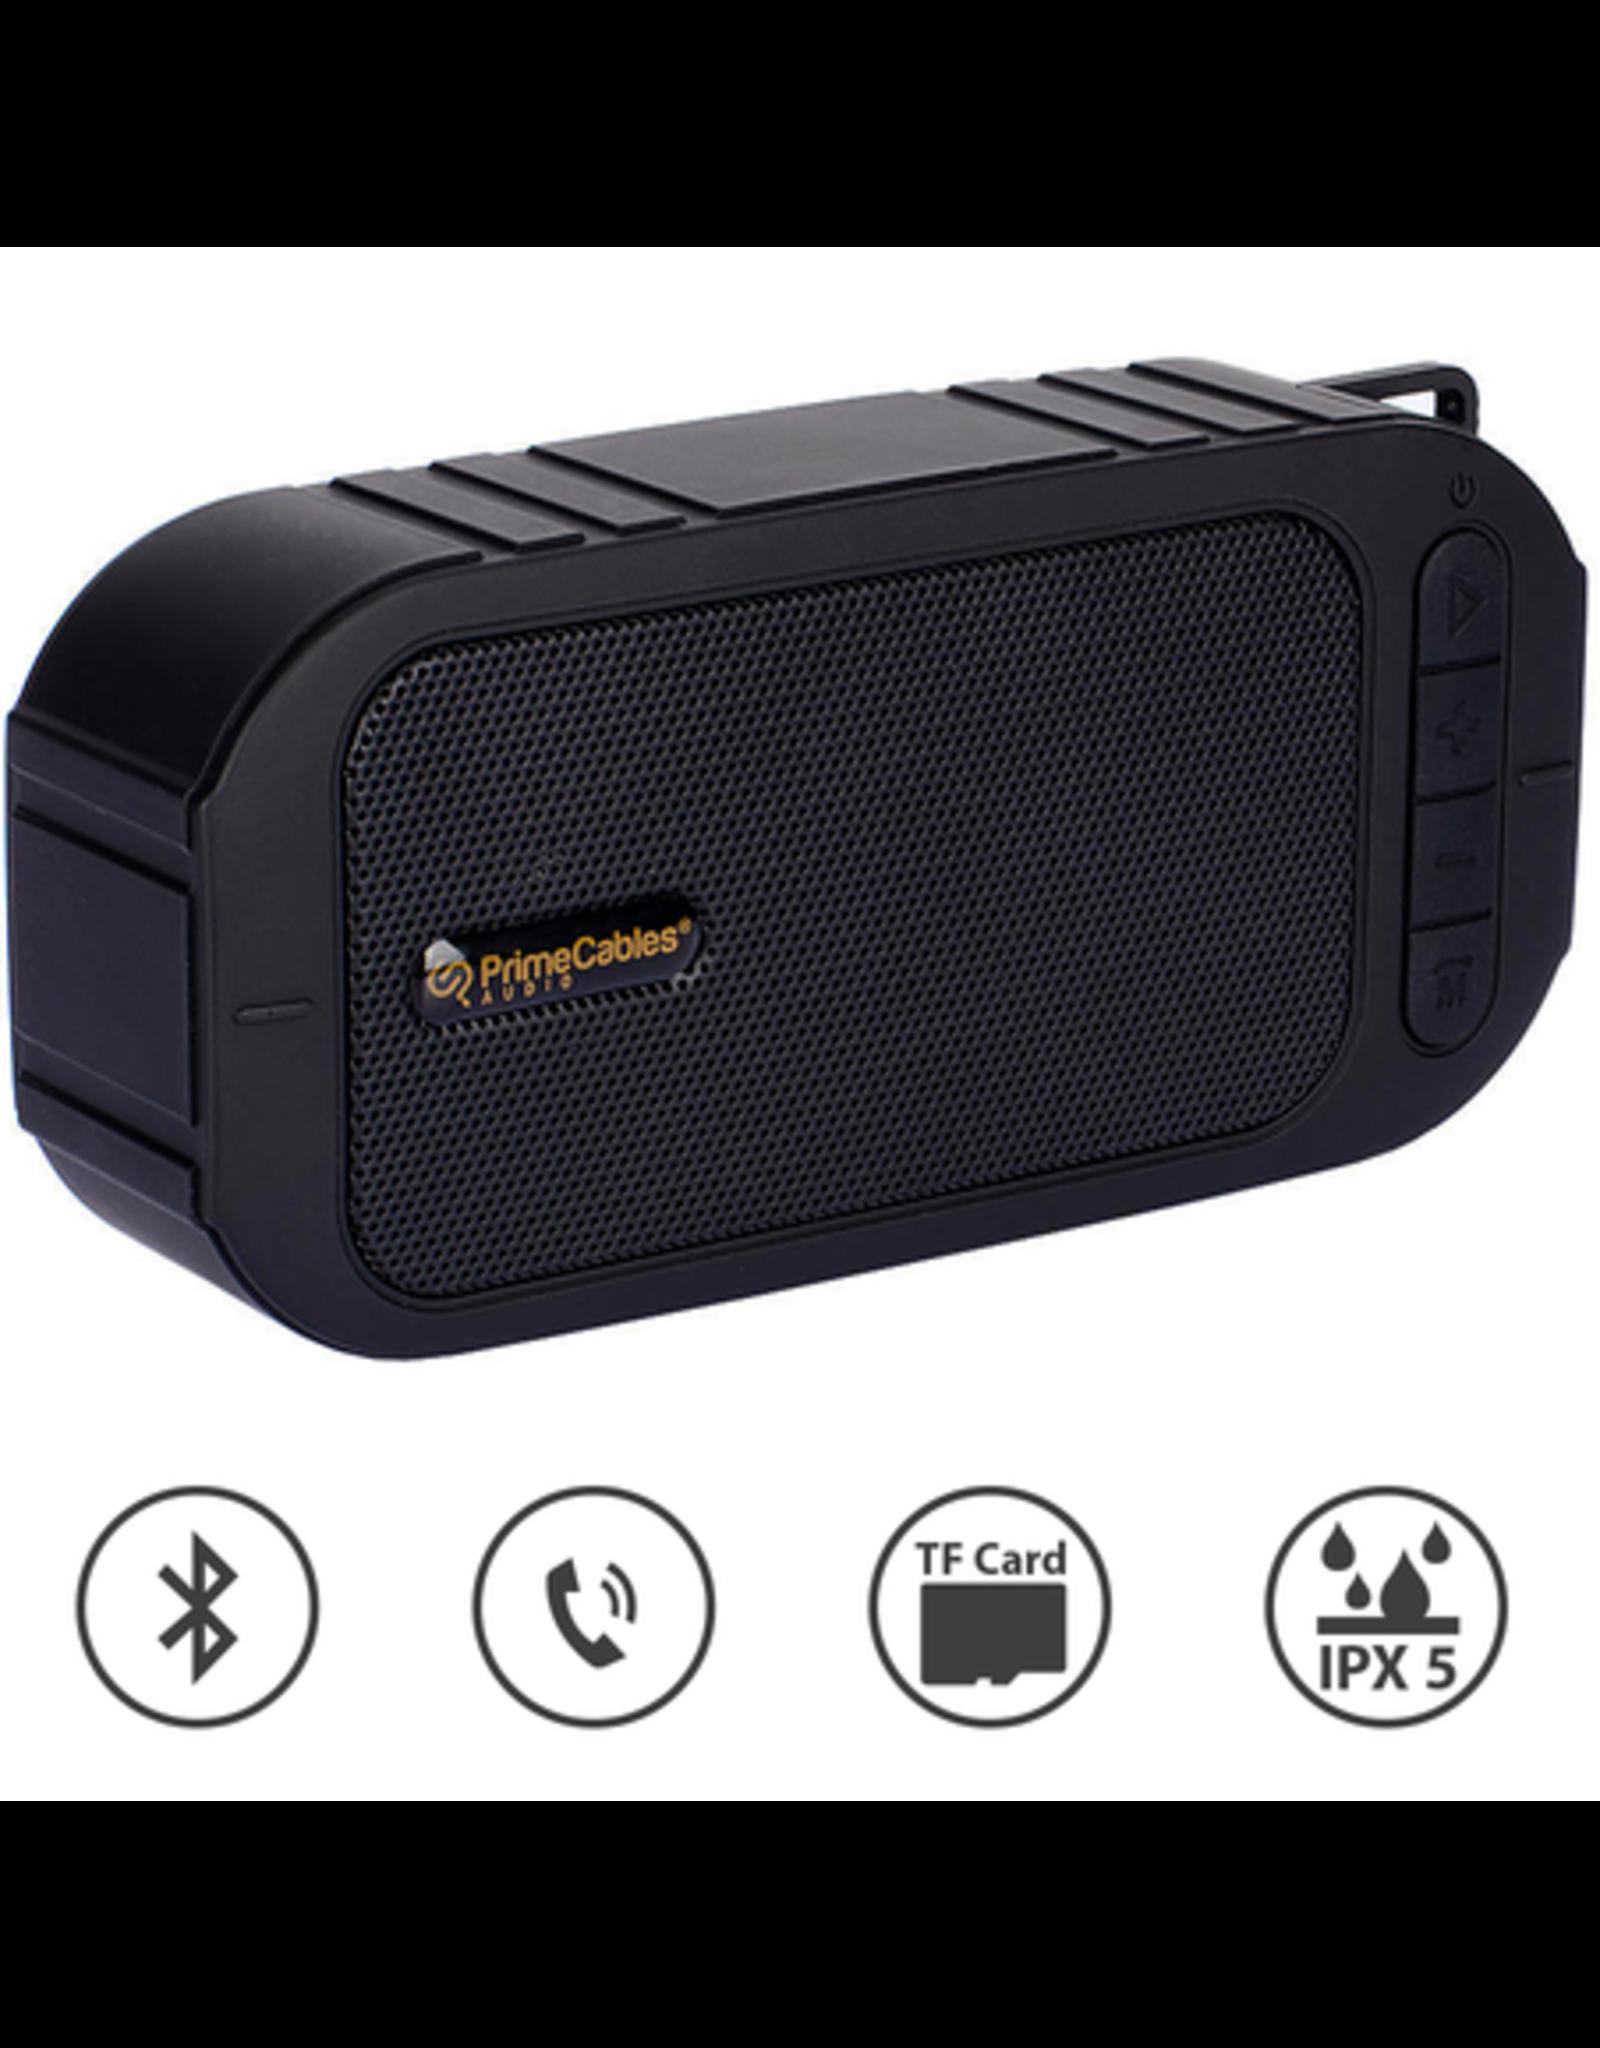 PrimeCables BT3.0 IPX5 Waterproof Bluetooth Speaker